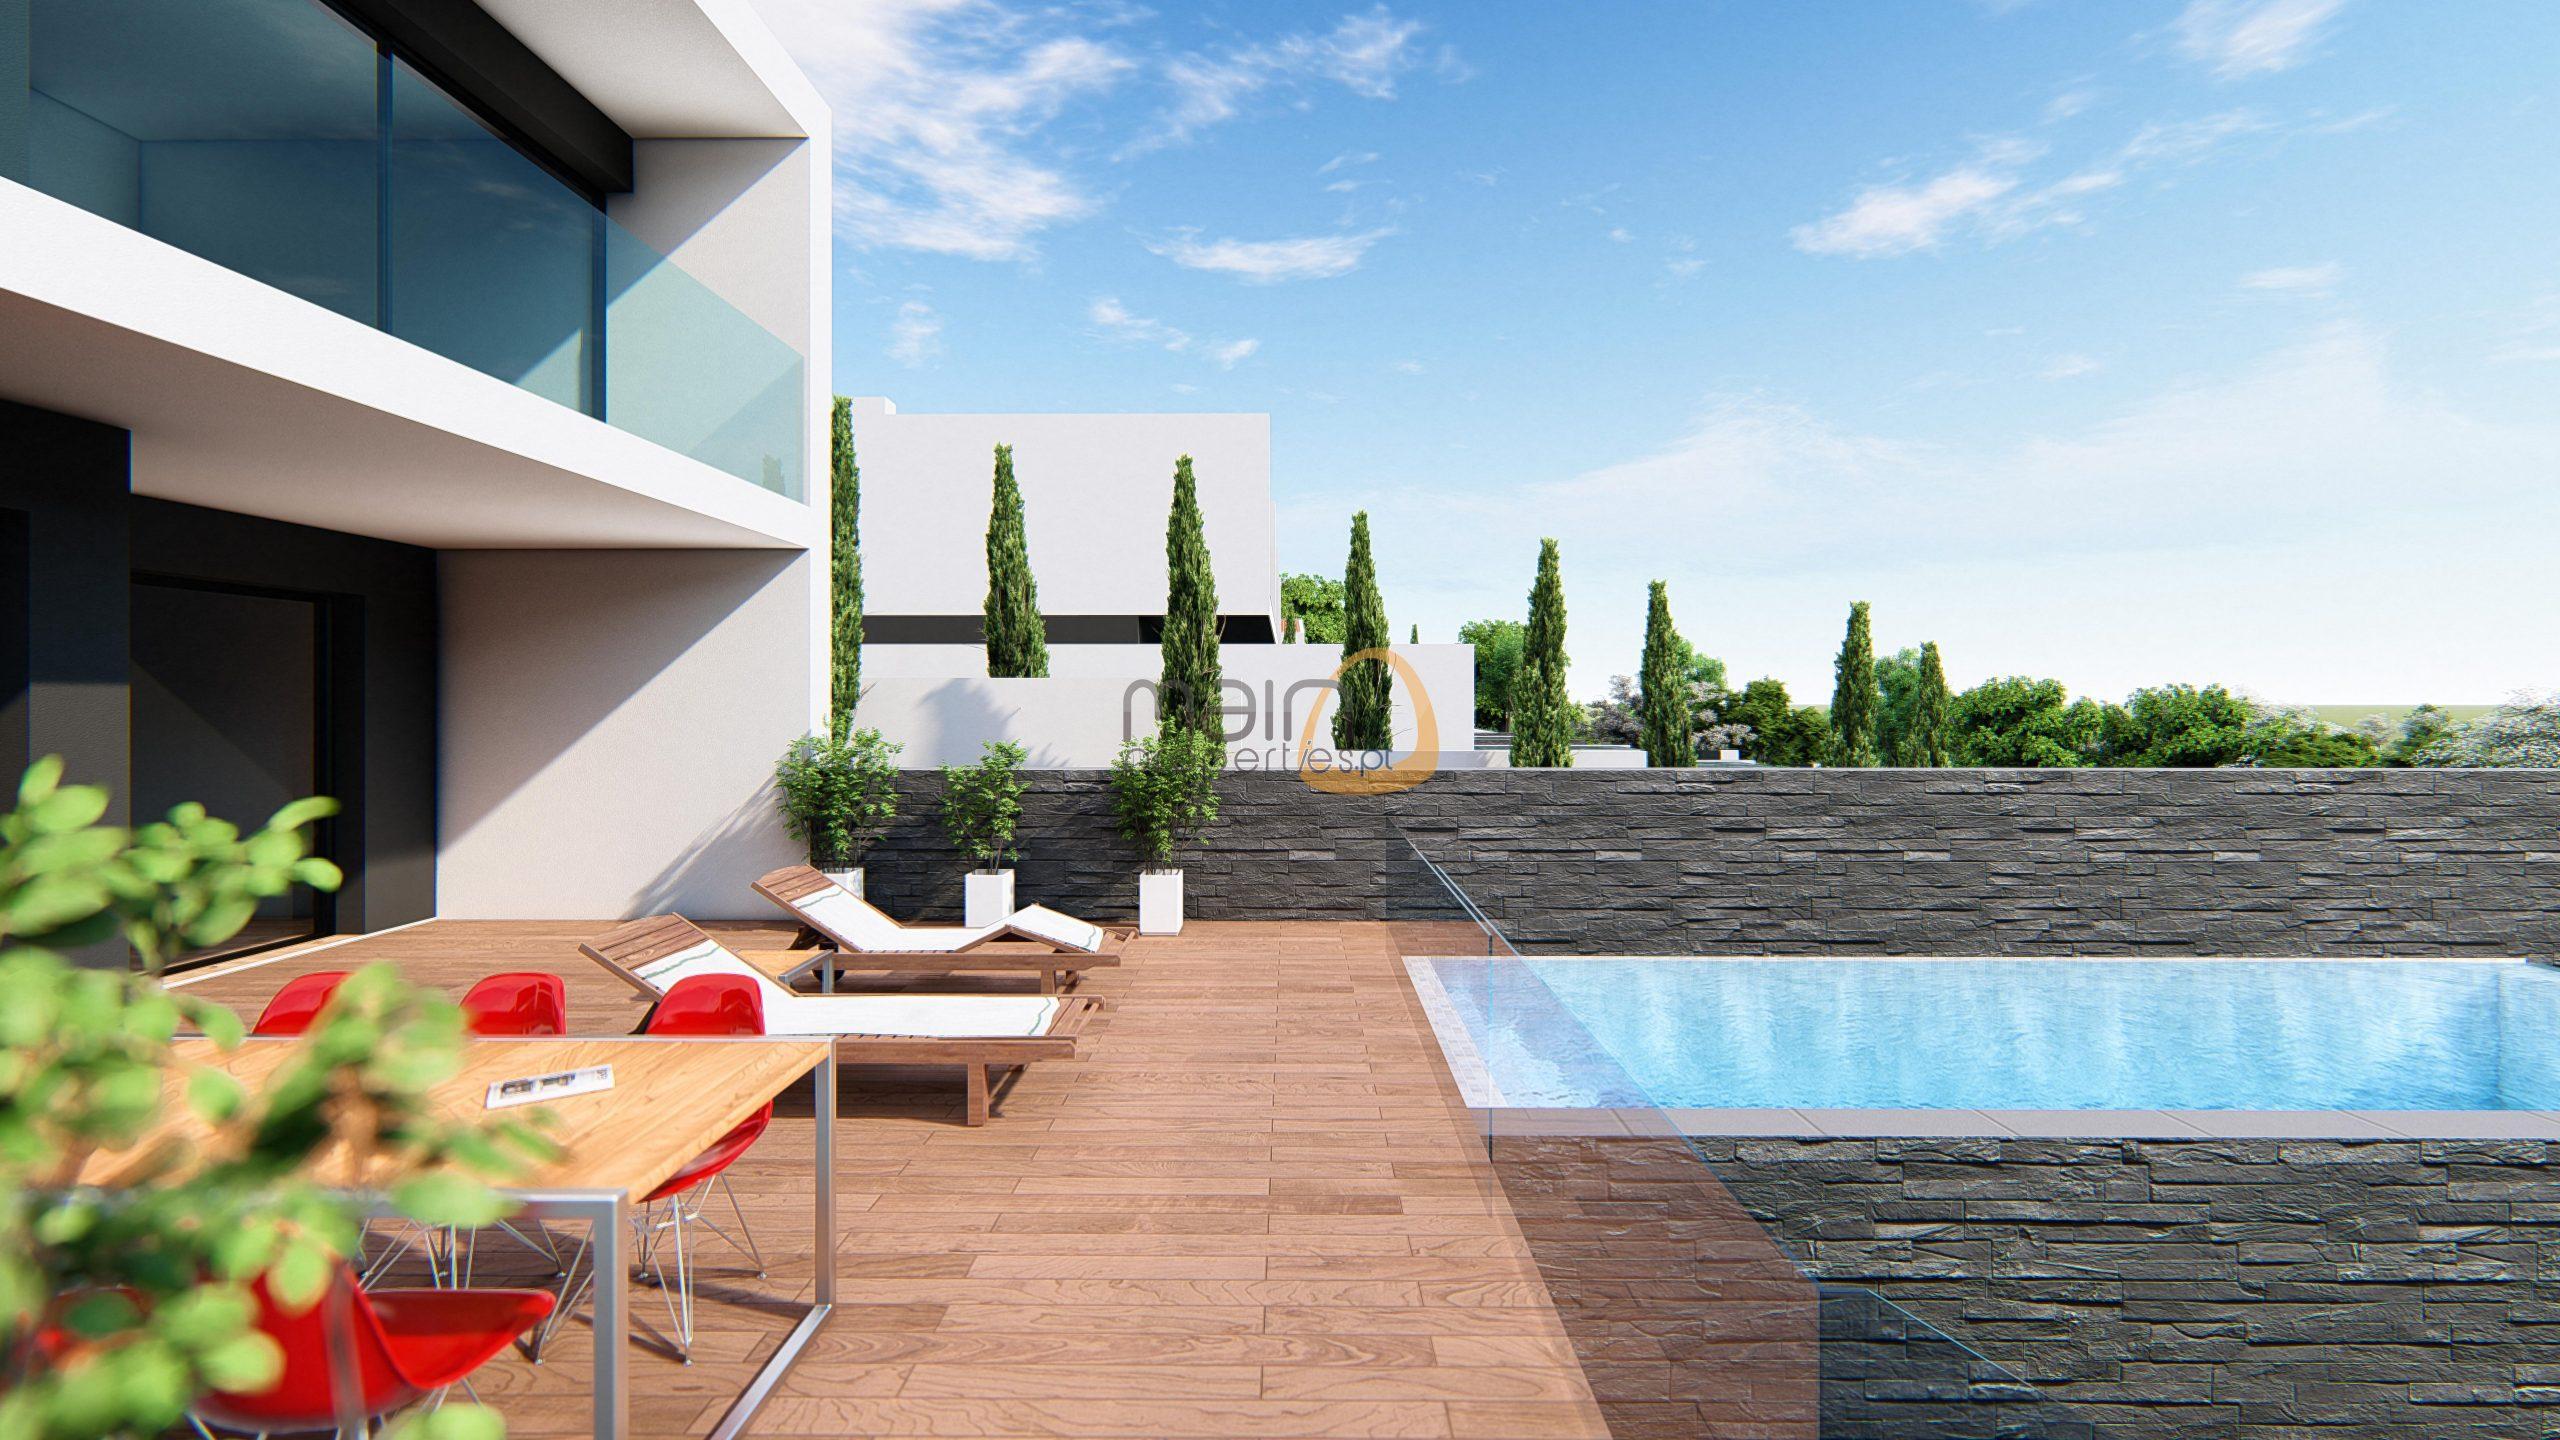 land-for-development-of-eleven-villas-with-sea-views-in-almancil-algarve-portugal-property-real-estate-11